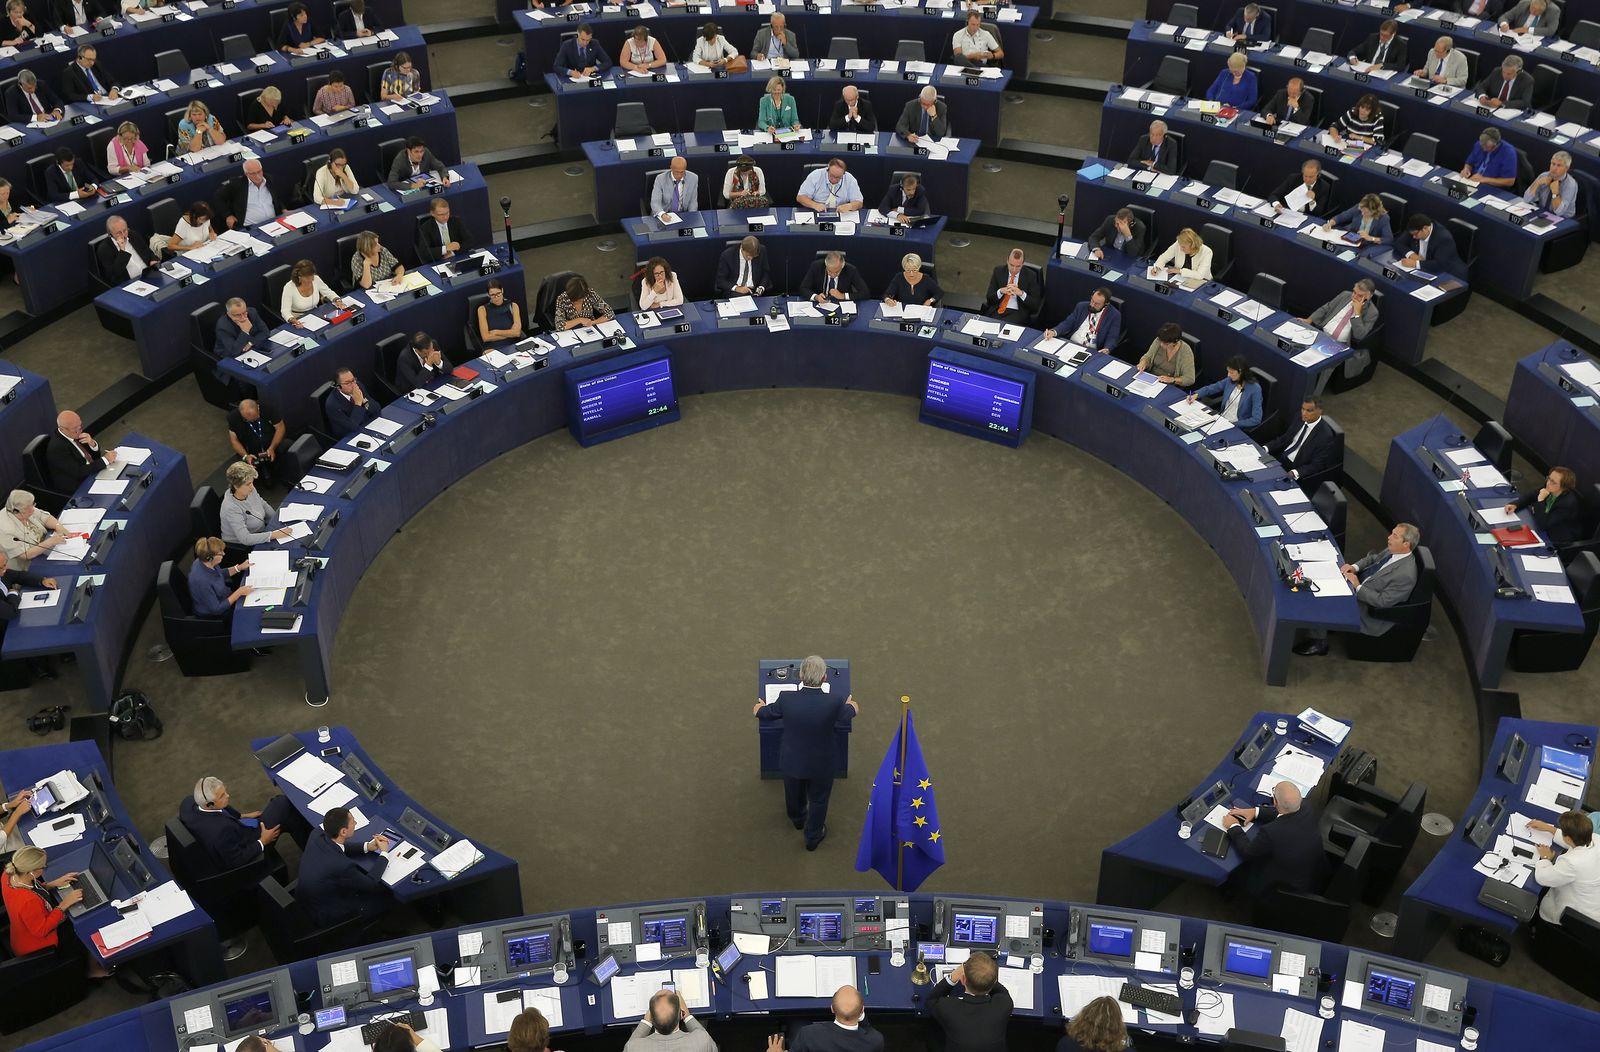 EU/ Juncker